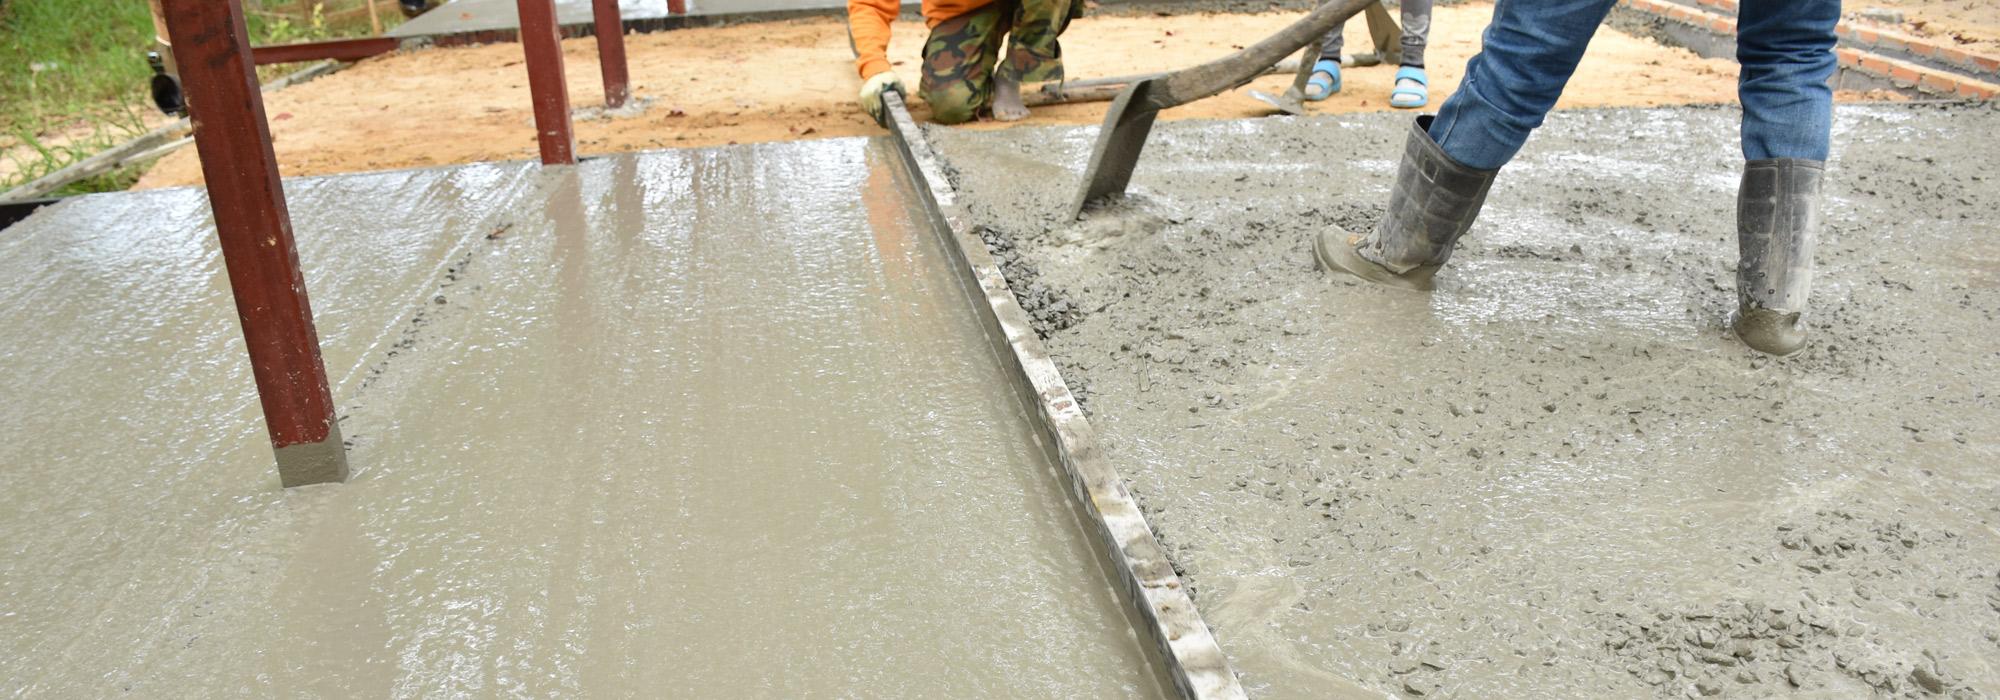 Concrete Pumping Jobs